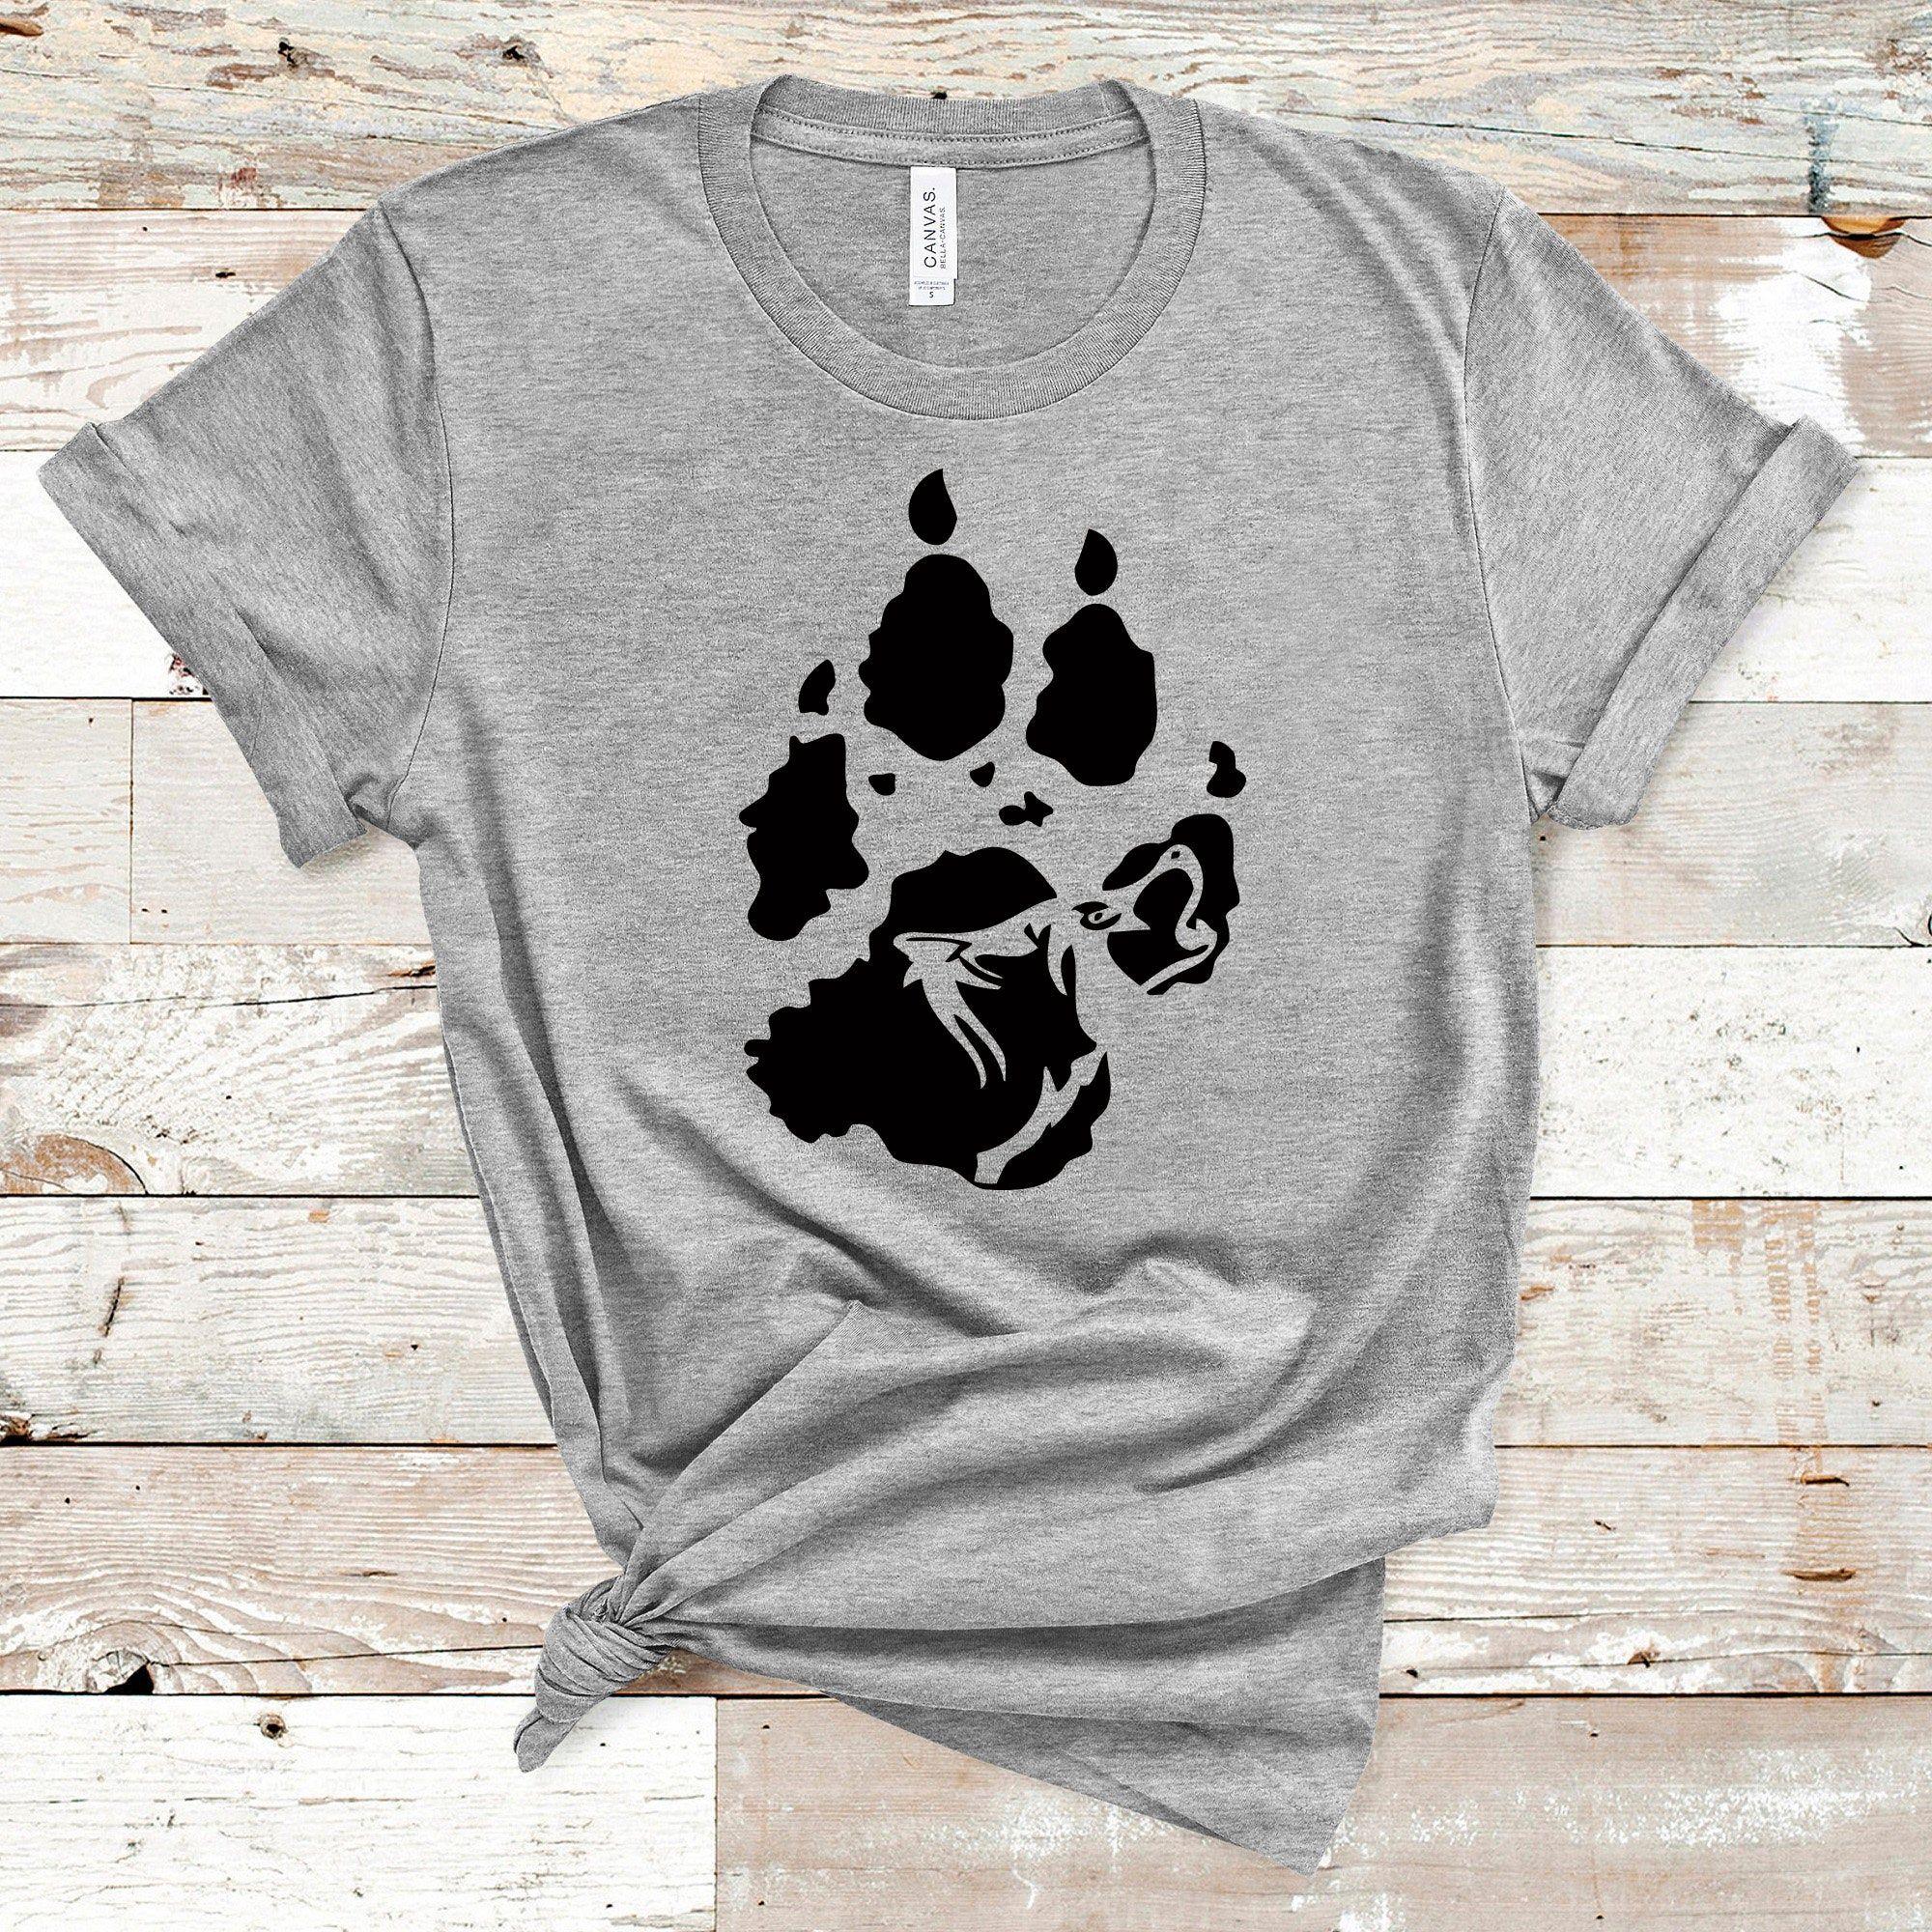 Wolf Svg Wolf Paw Print Svg Wolf Shirt Svg Animal Svg File Etsy Wolf Paw Print Wolf Paw Wolf Shirt